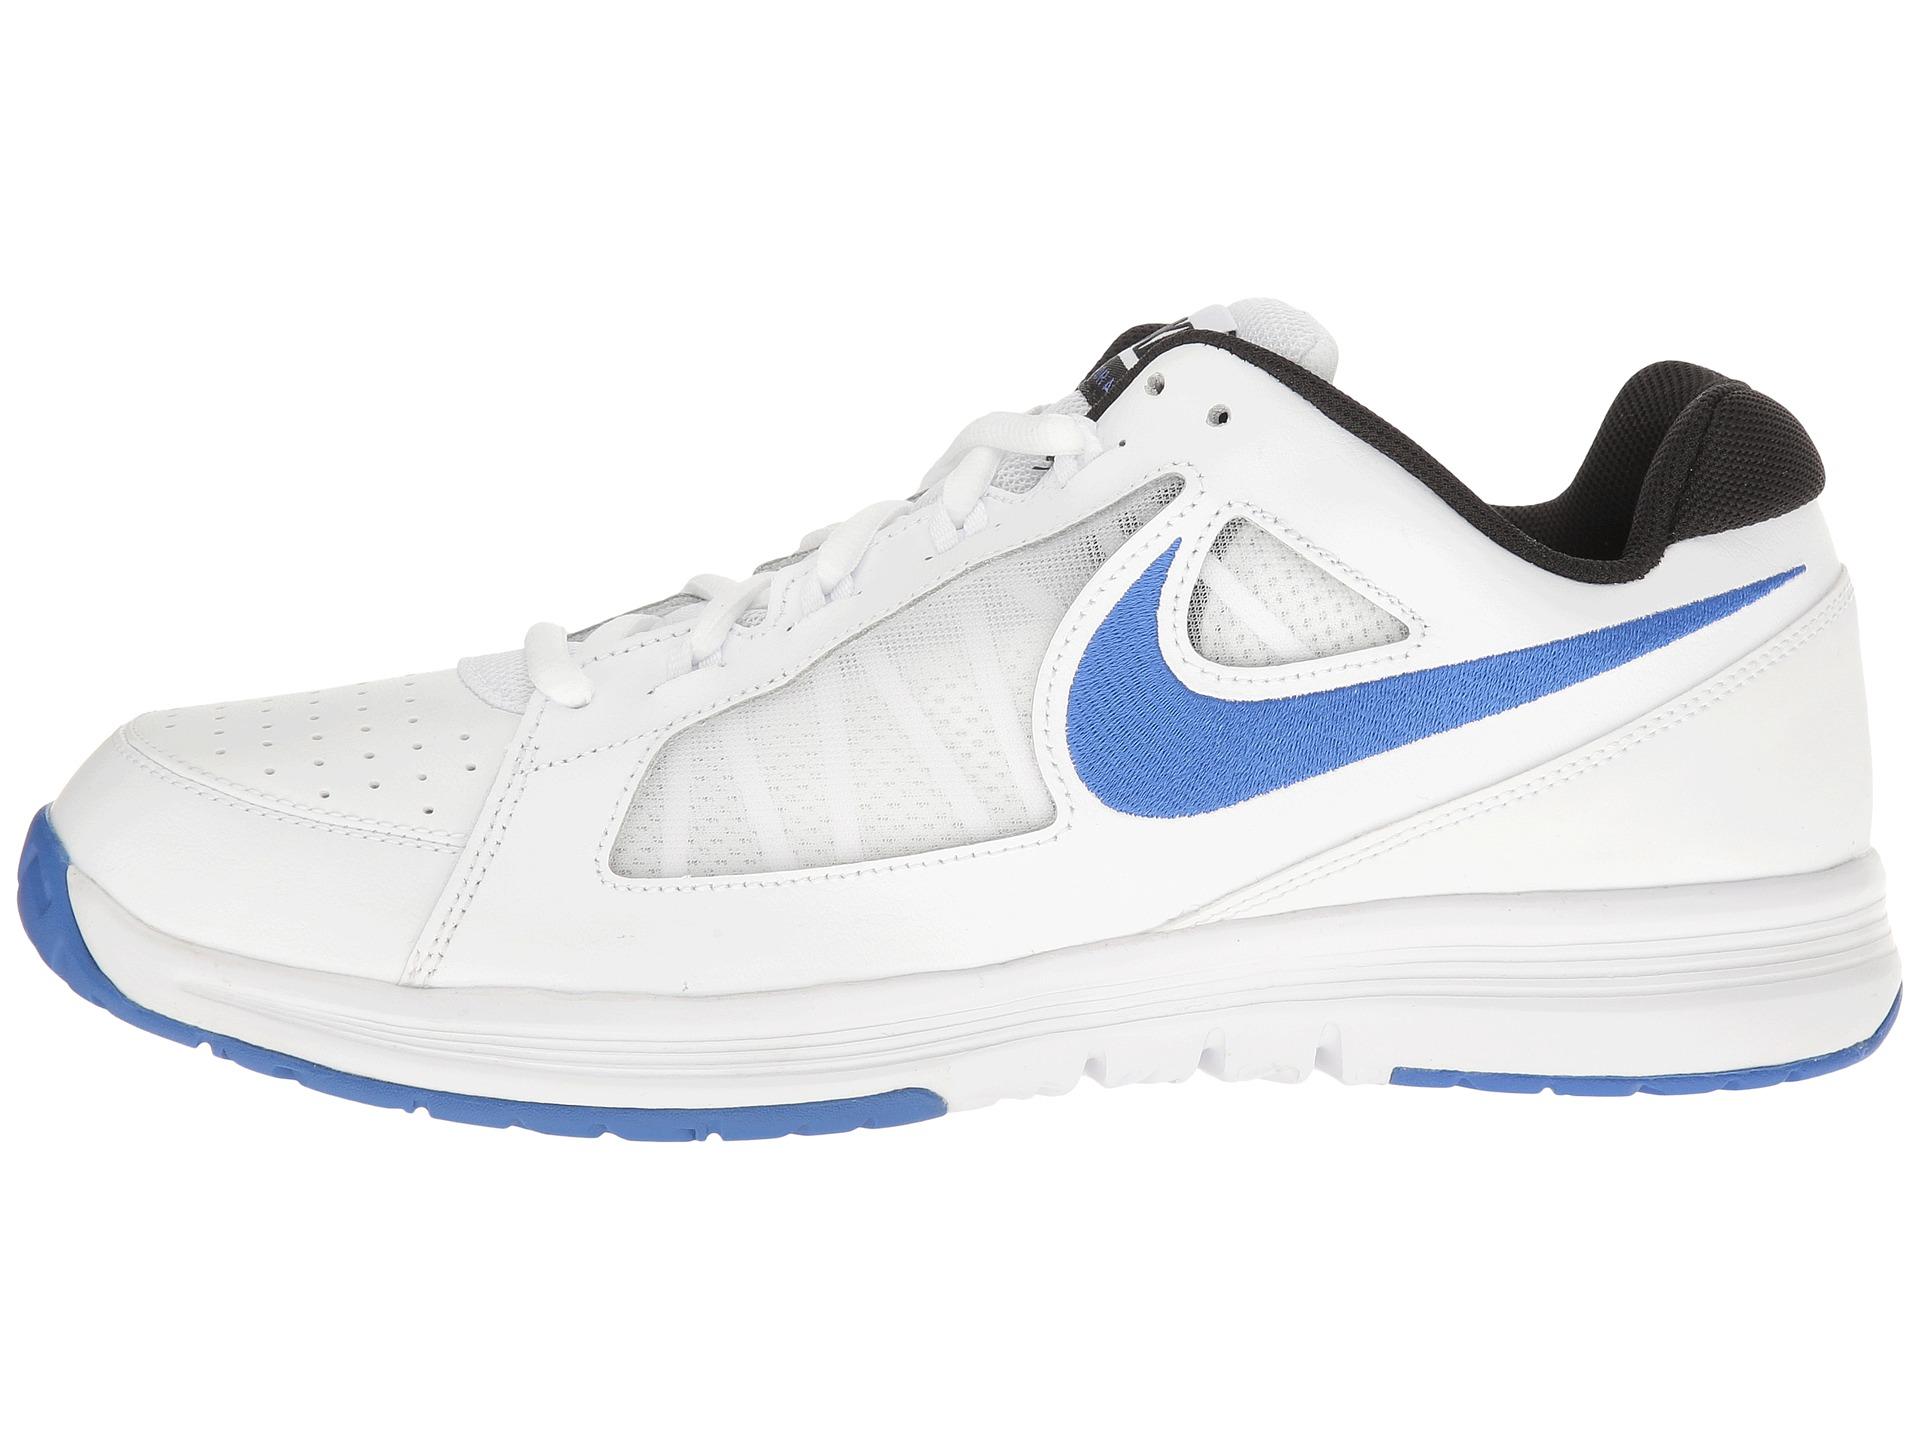 Nike Air Vapor Ace Shoe Weight